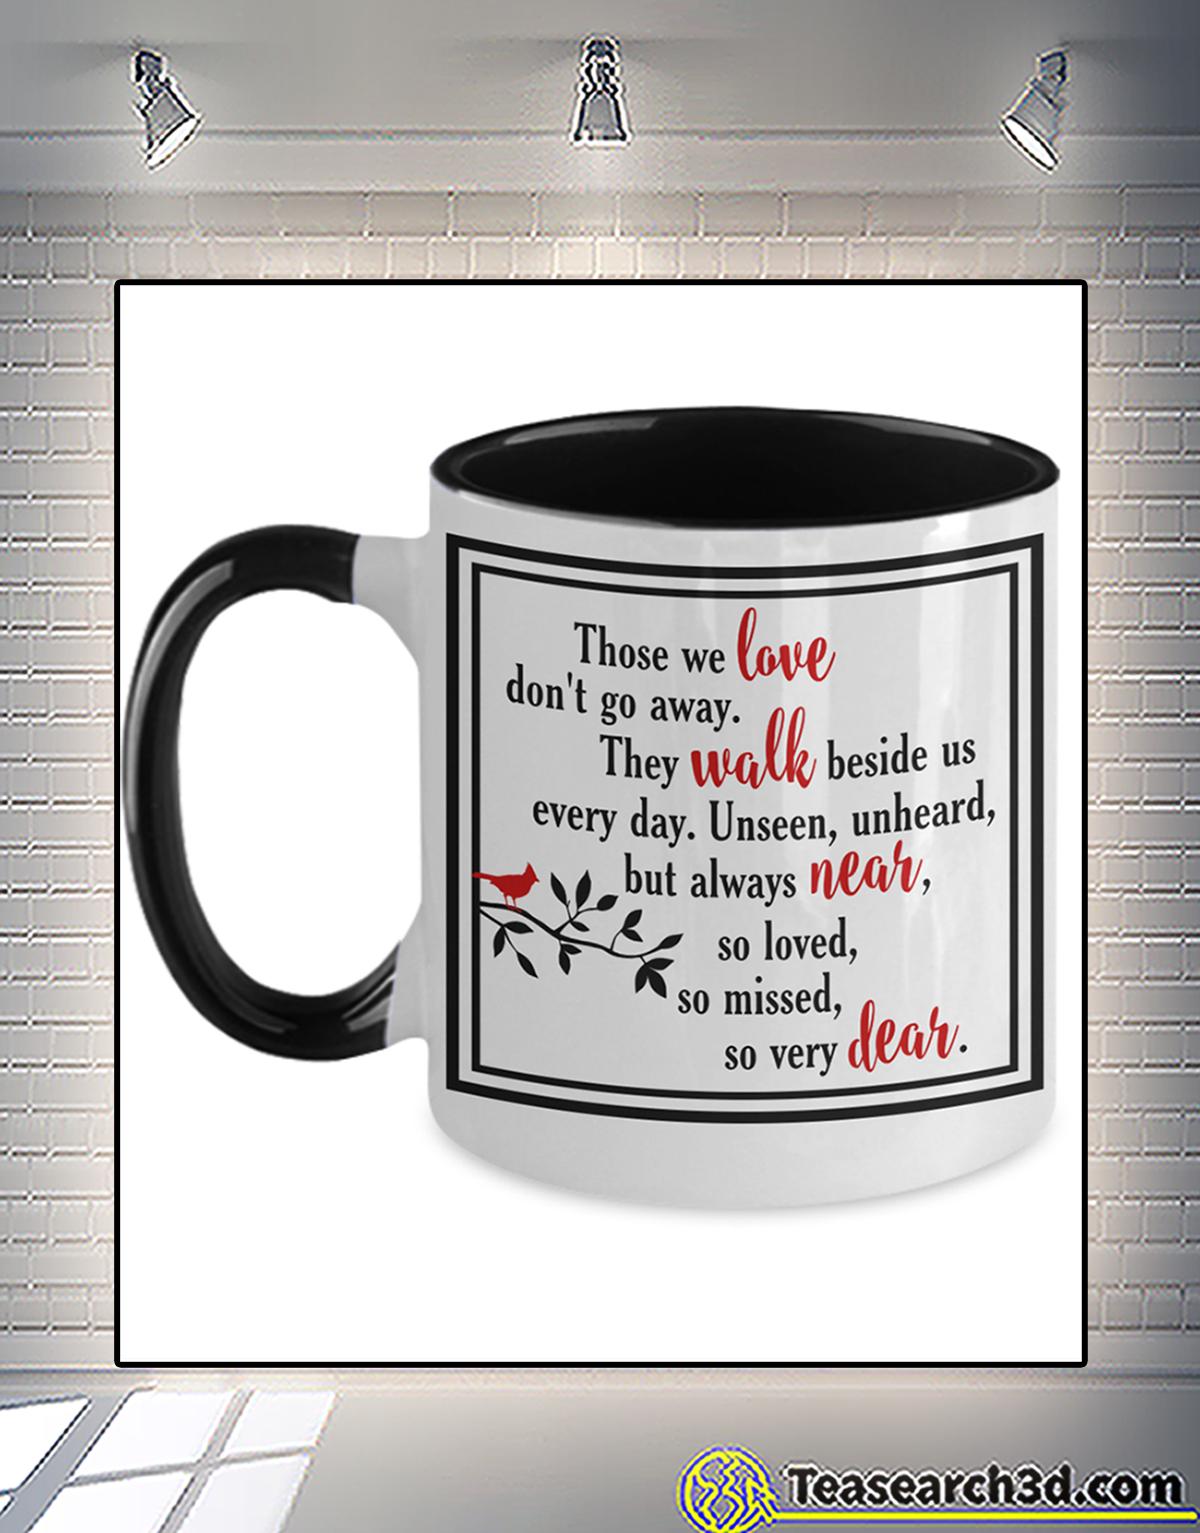 Cardinal those we love don't go away accent mug 2